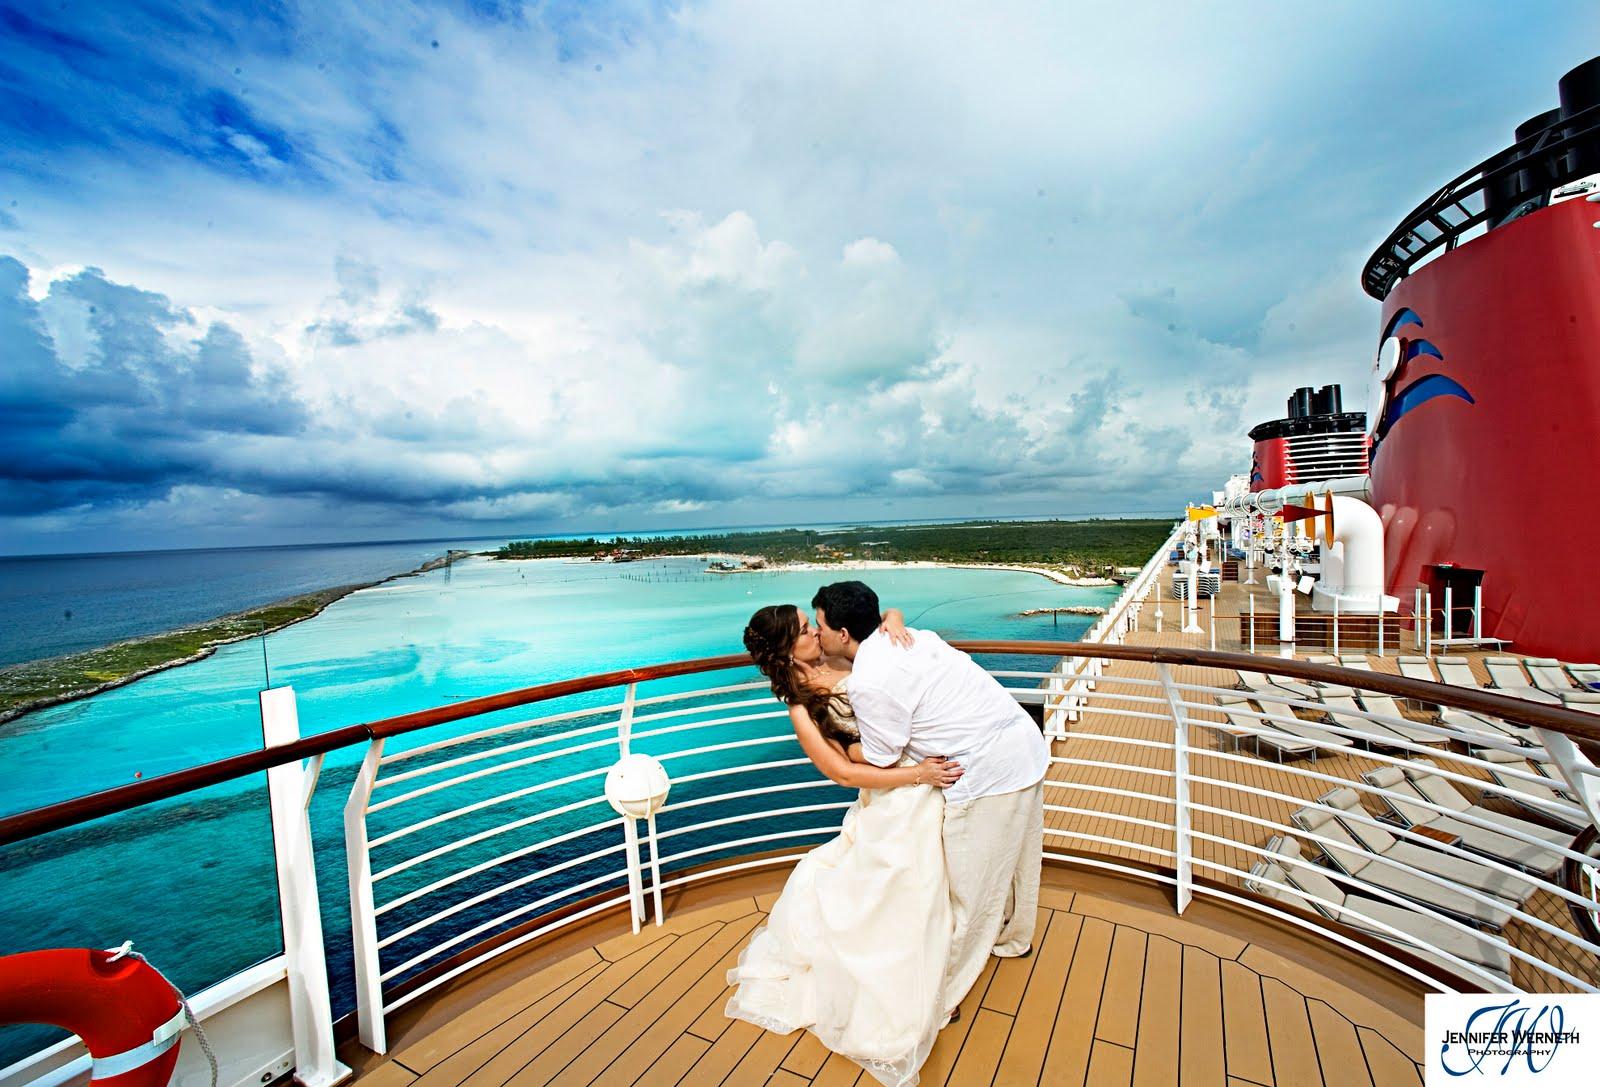 Disney Cruise Wedding Picture Disney Cruise Wedding Image Disney Cruise Wedding Wallpaper